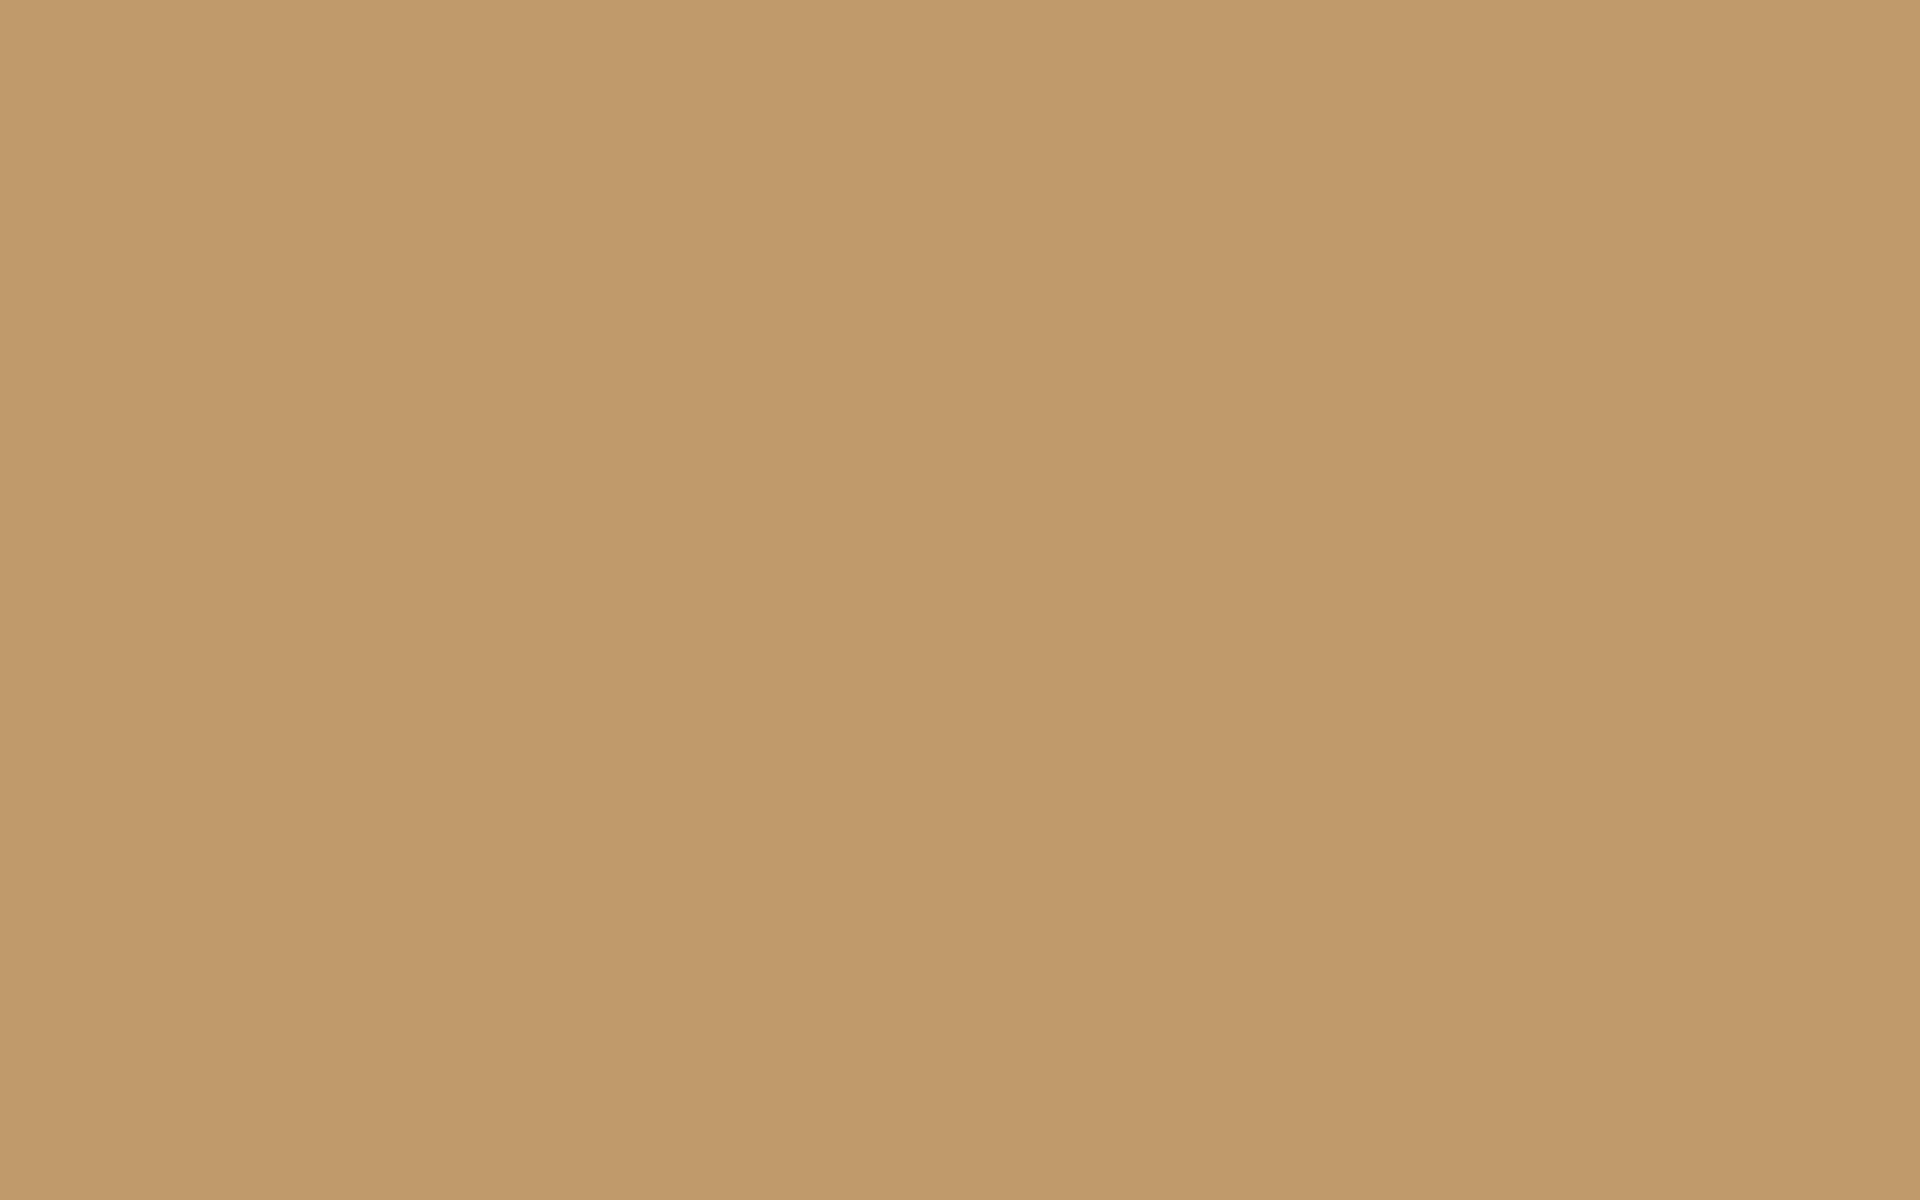 1920x1200 Camel Solid Color Background